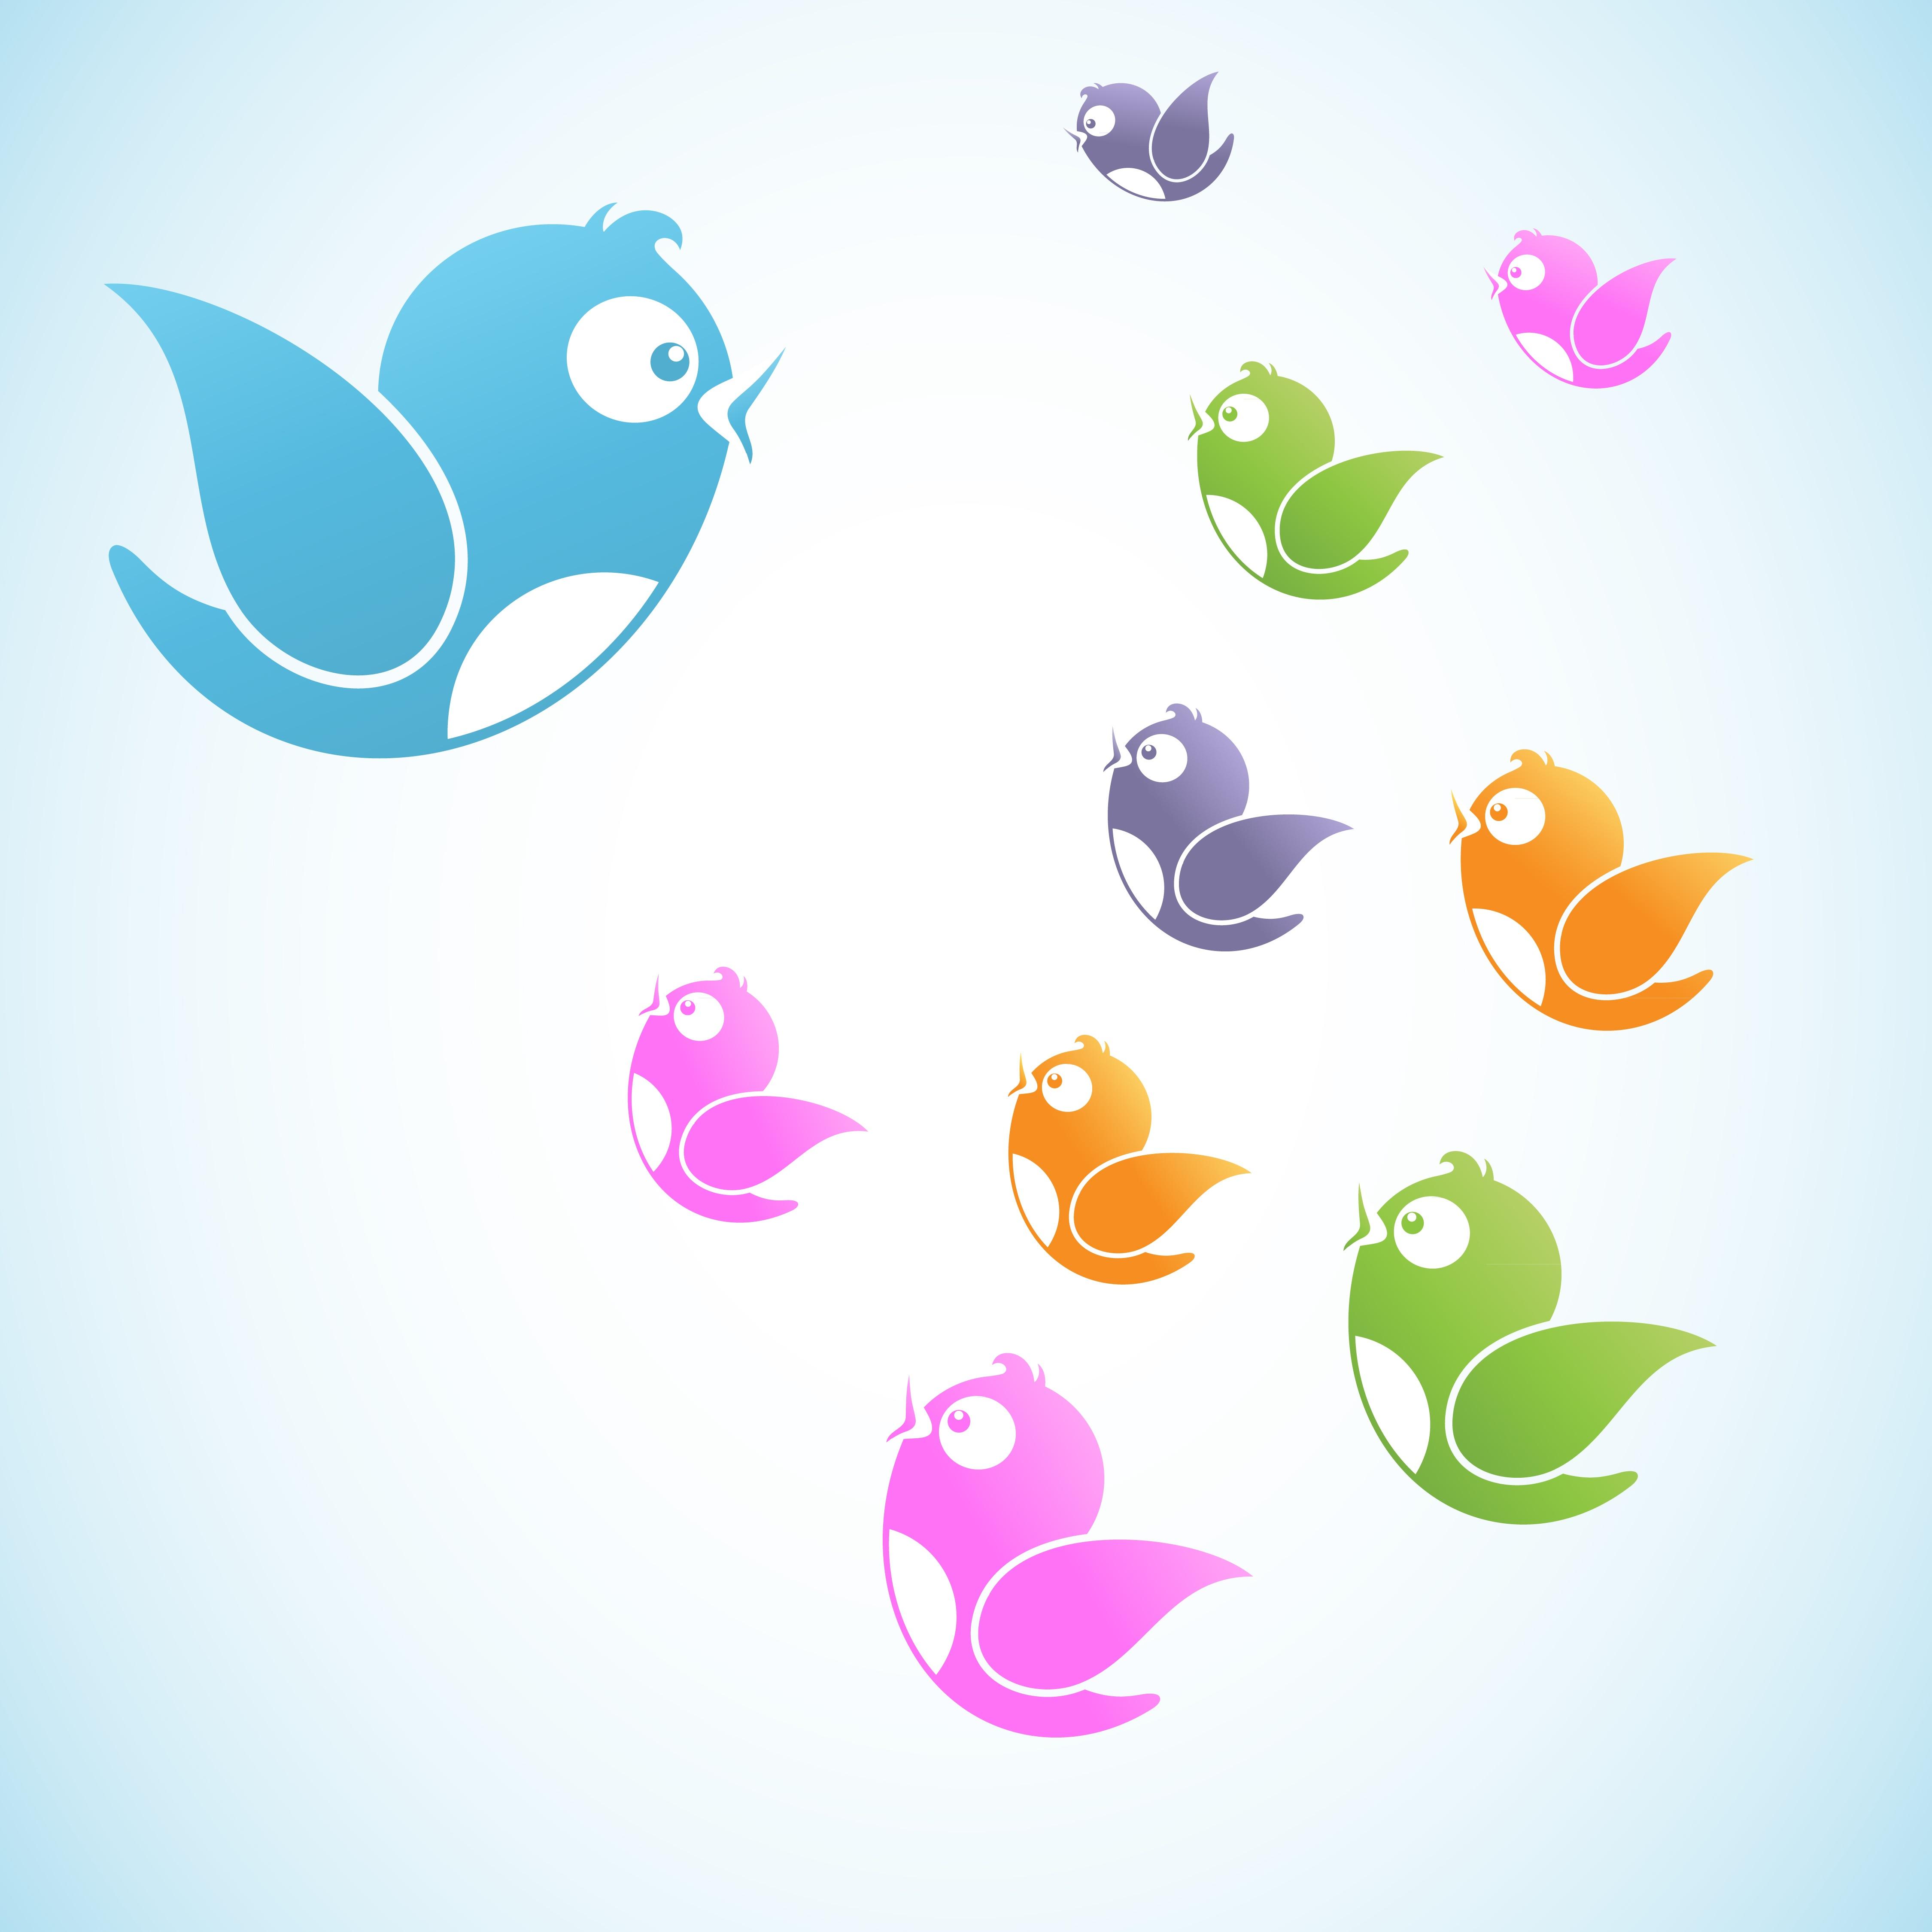 Ways-to-help-B2B-marketers-increase-twitter-followers